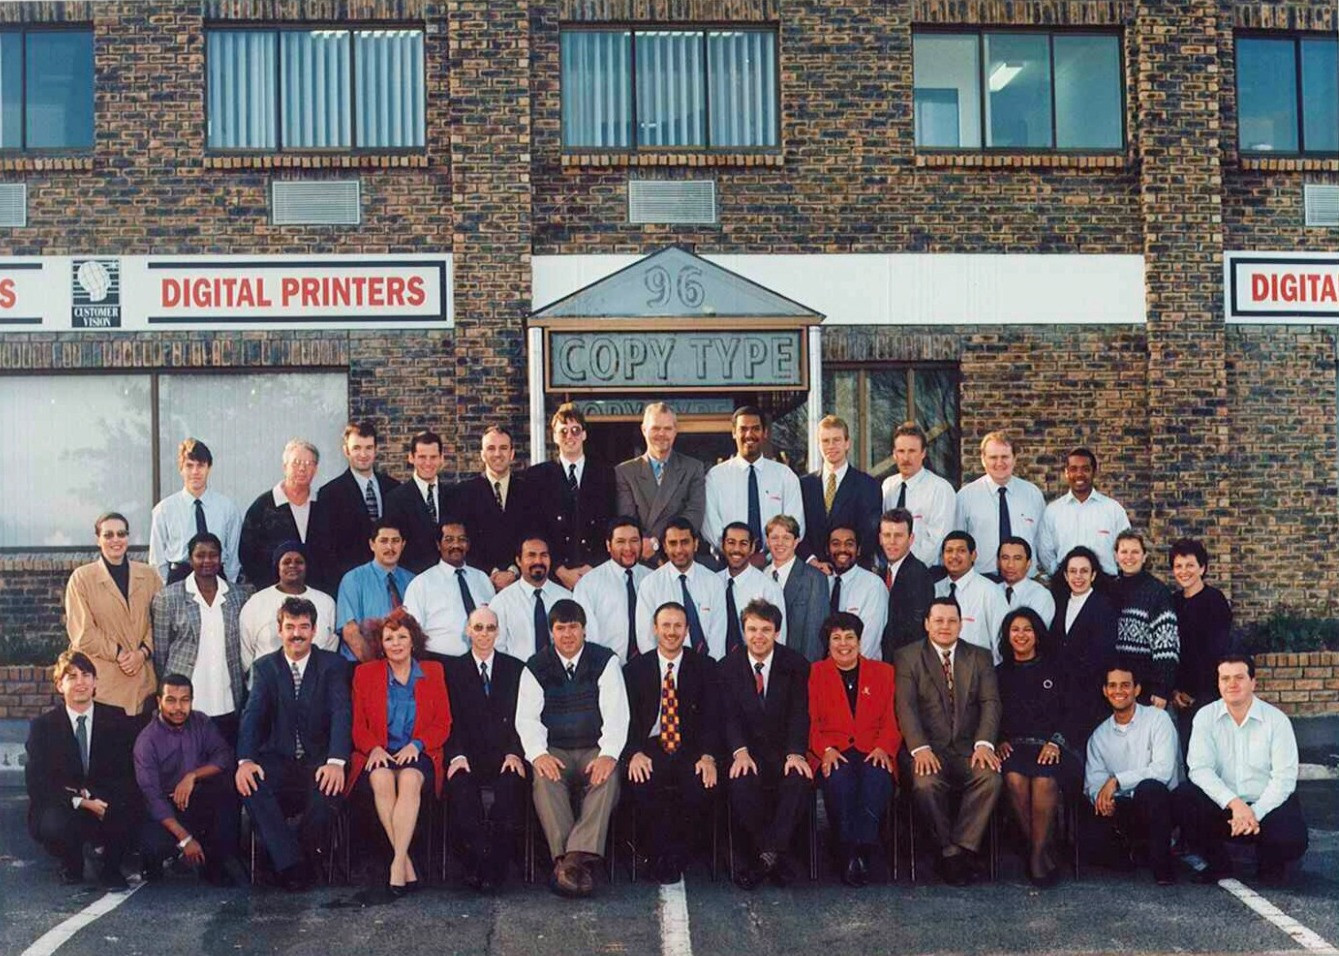 1997 Copytype Team.jpg